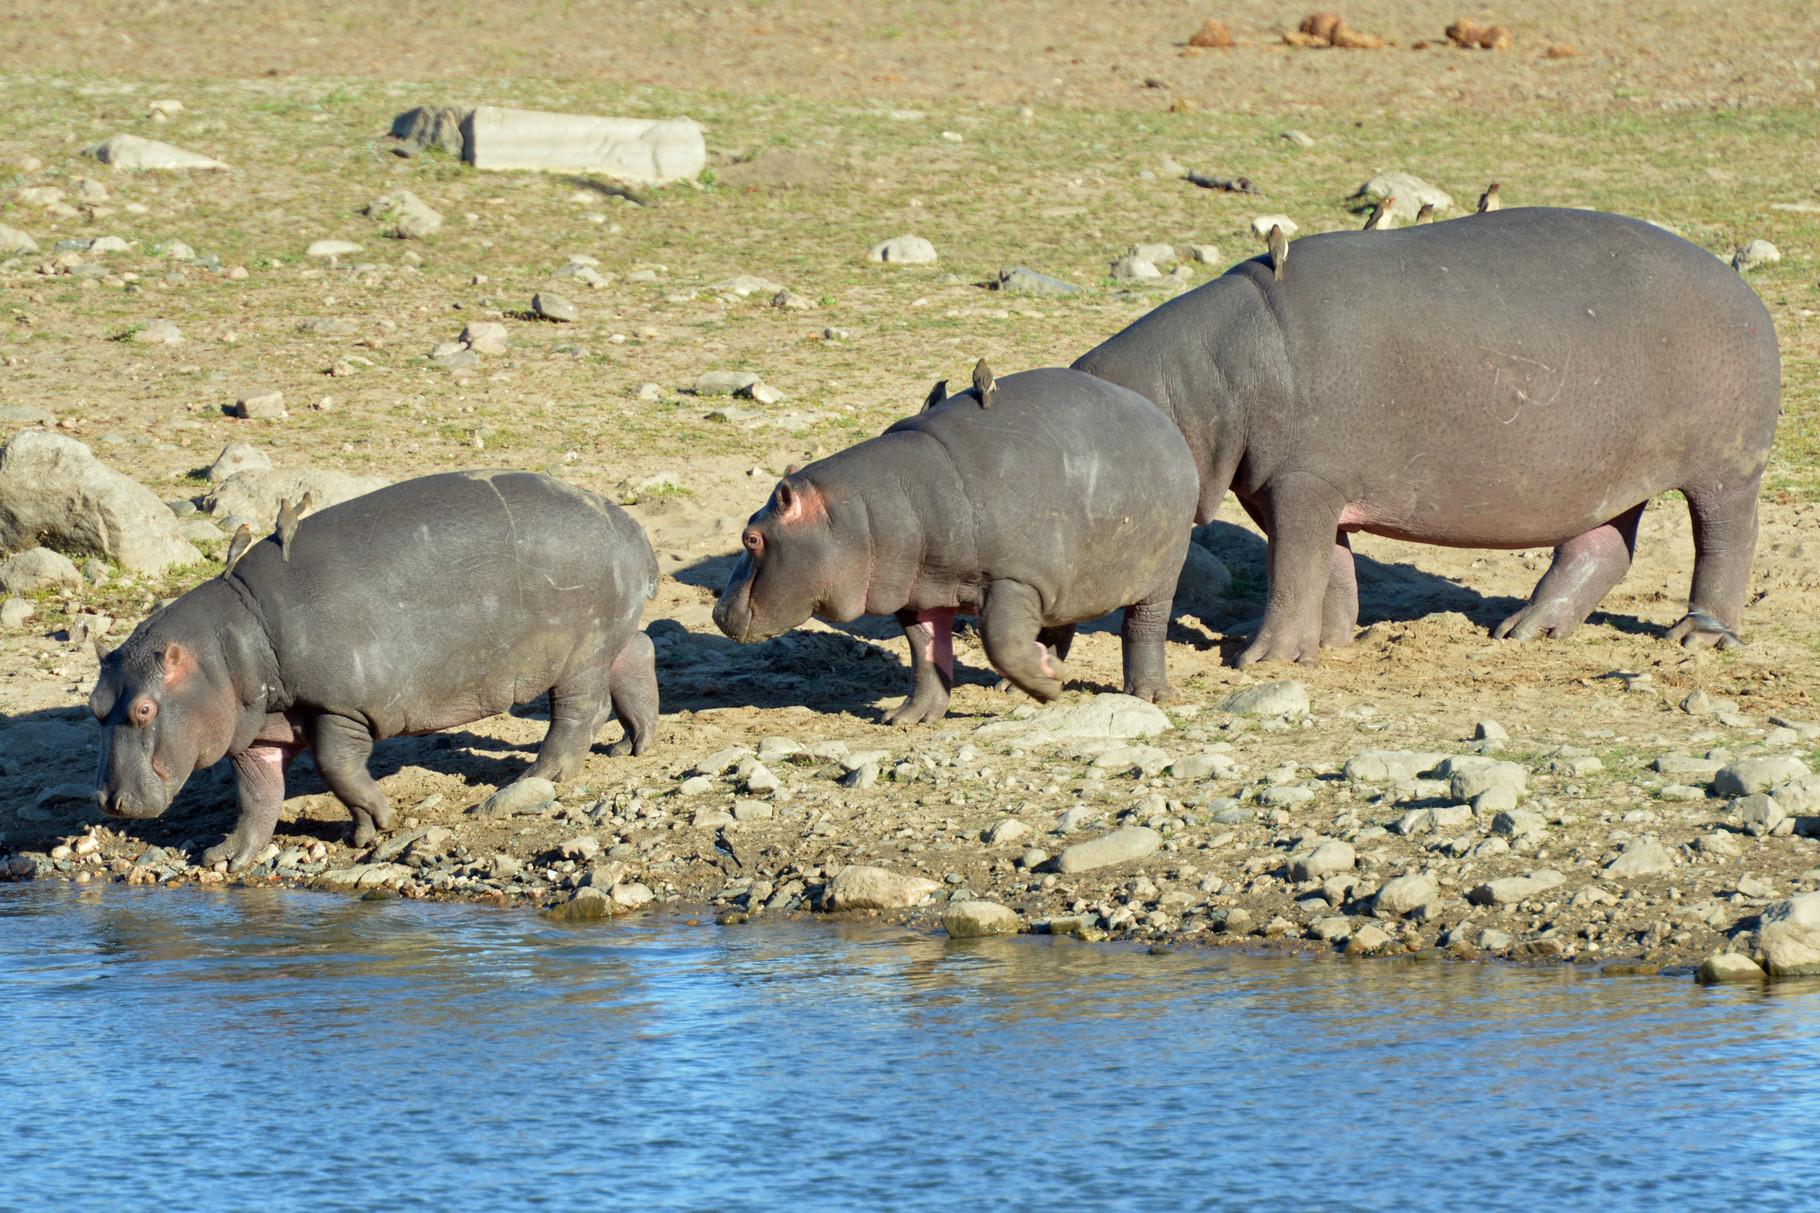 Wieso heissen die eigentlich Flusspferde?